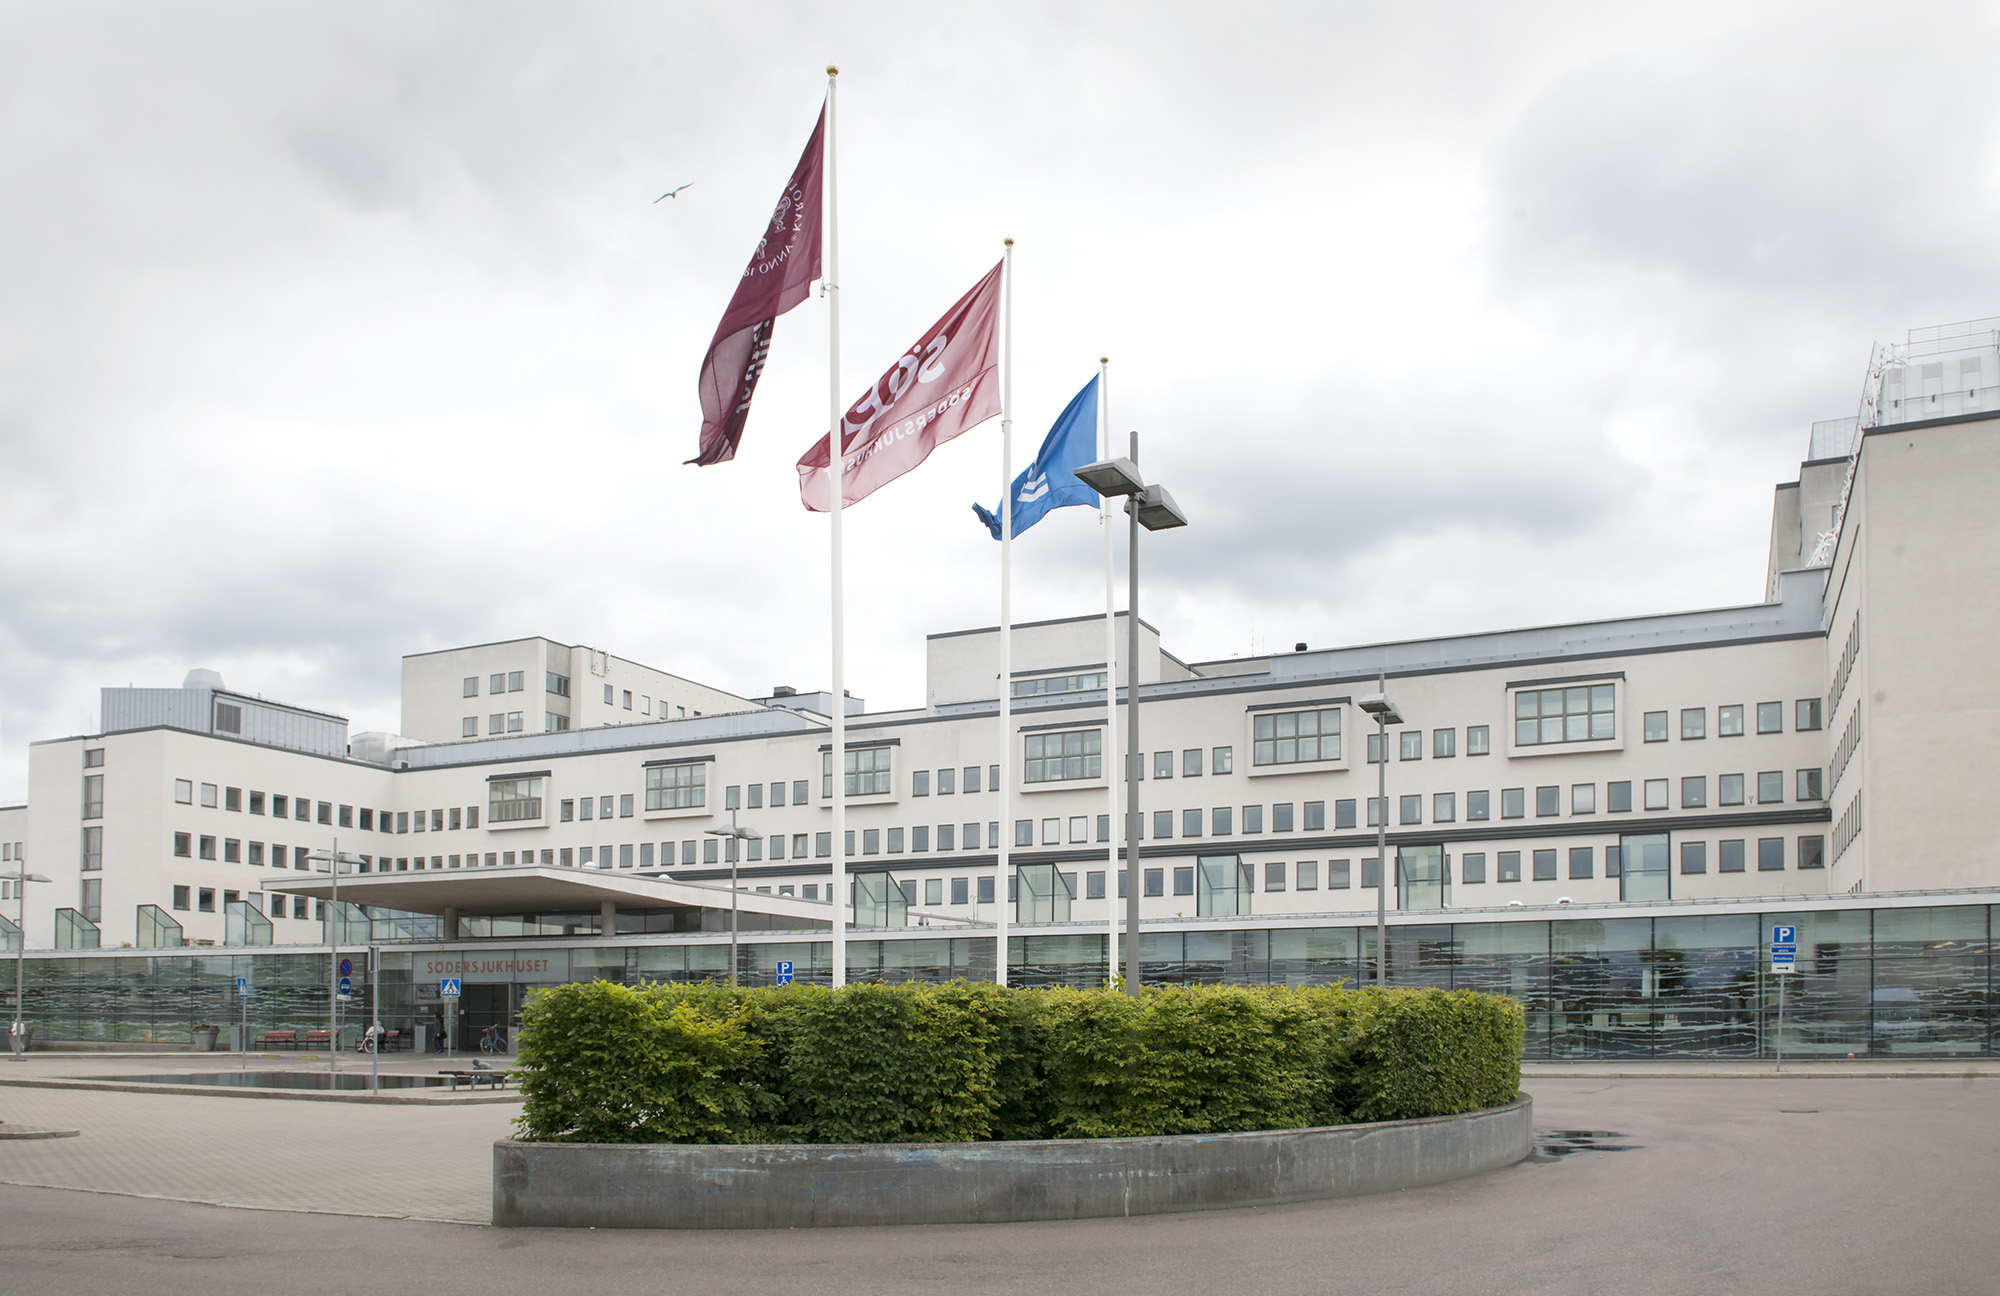 Södersjukhuset hospital in Stockholm